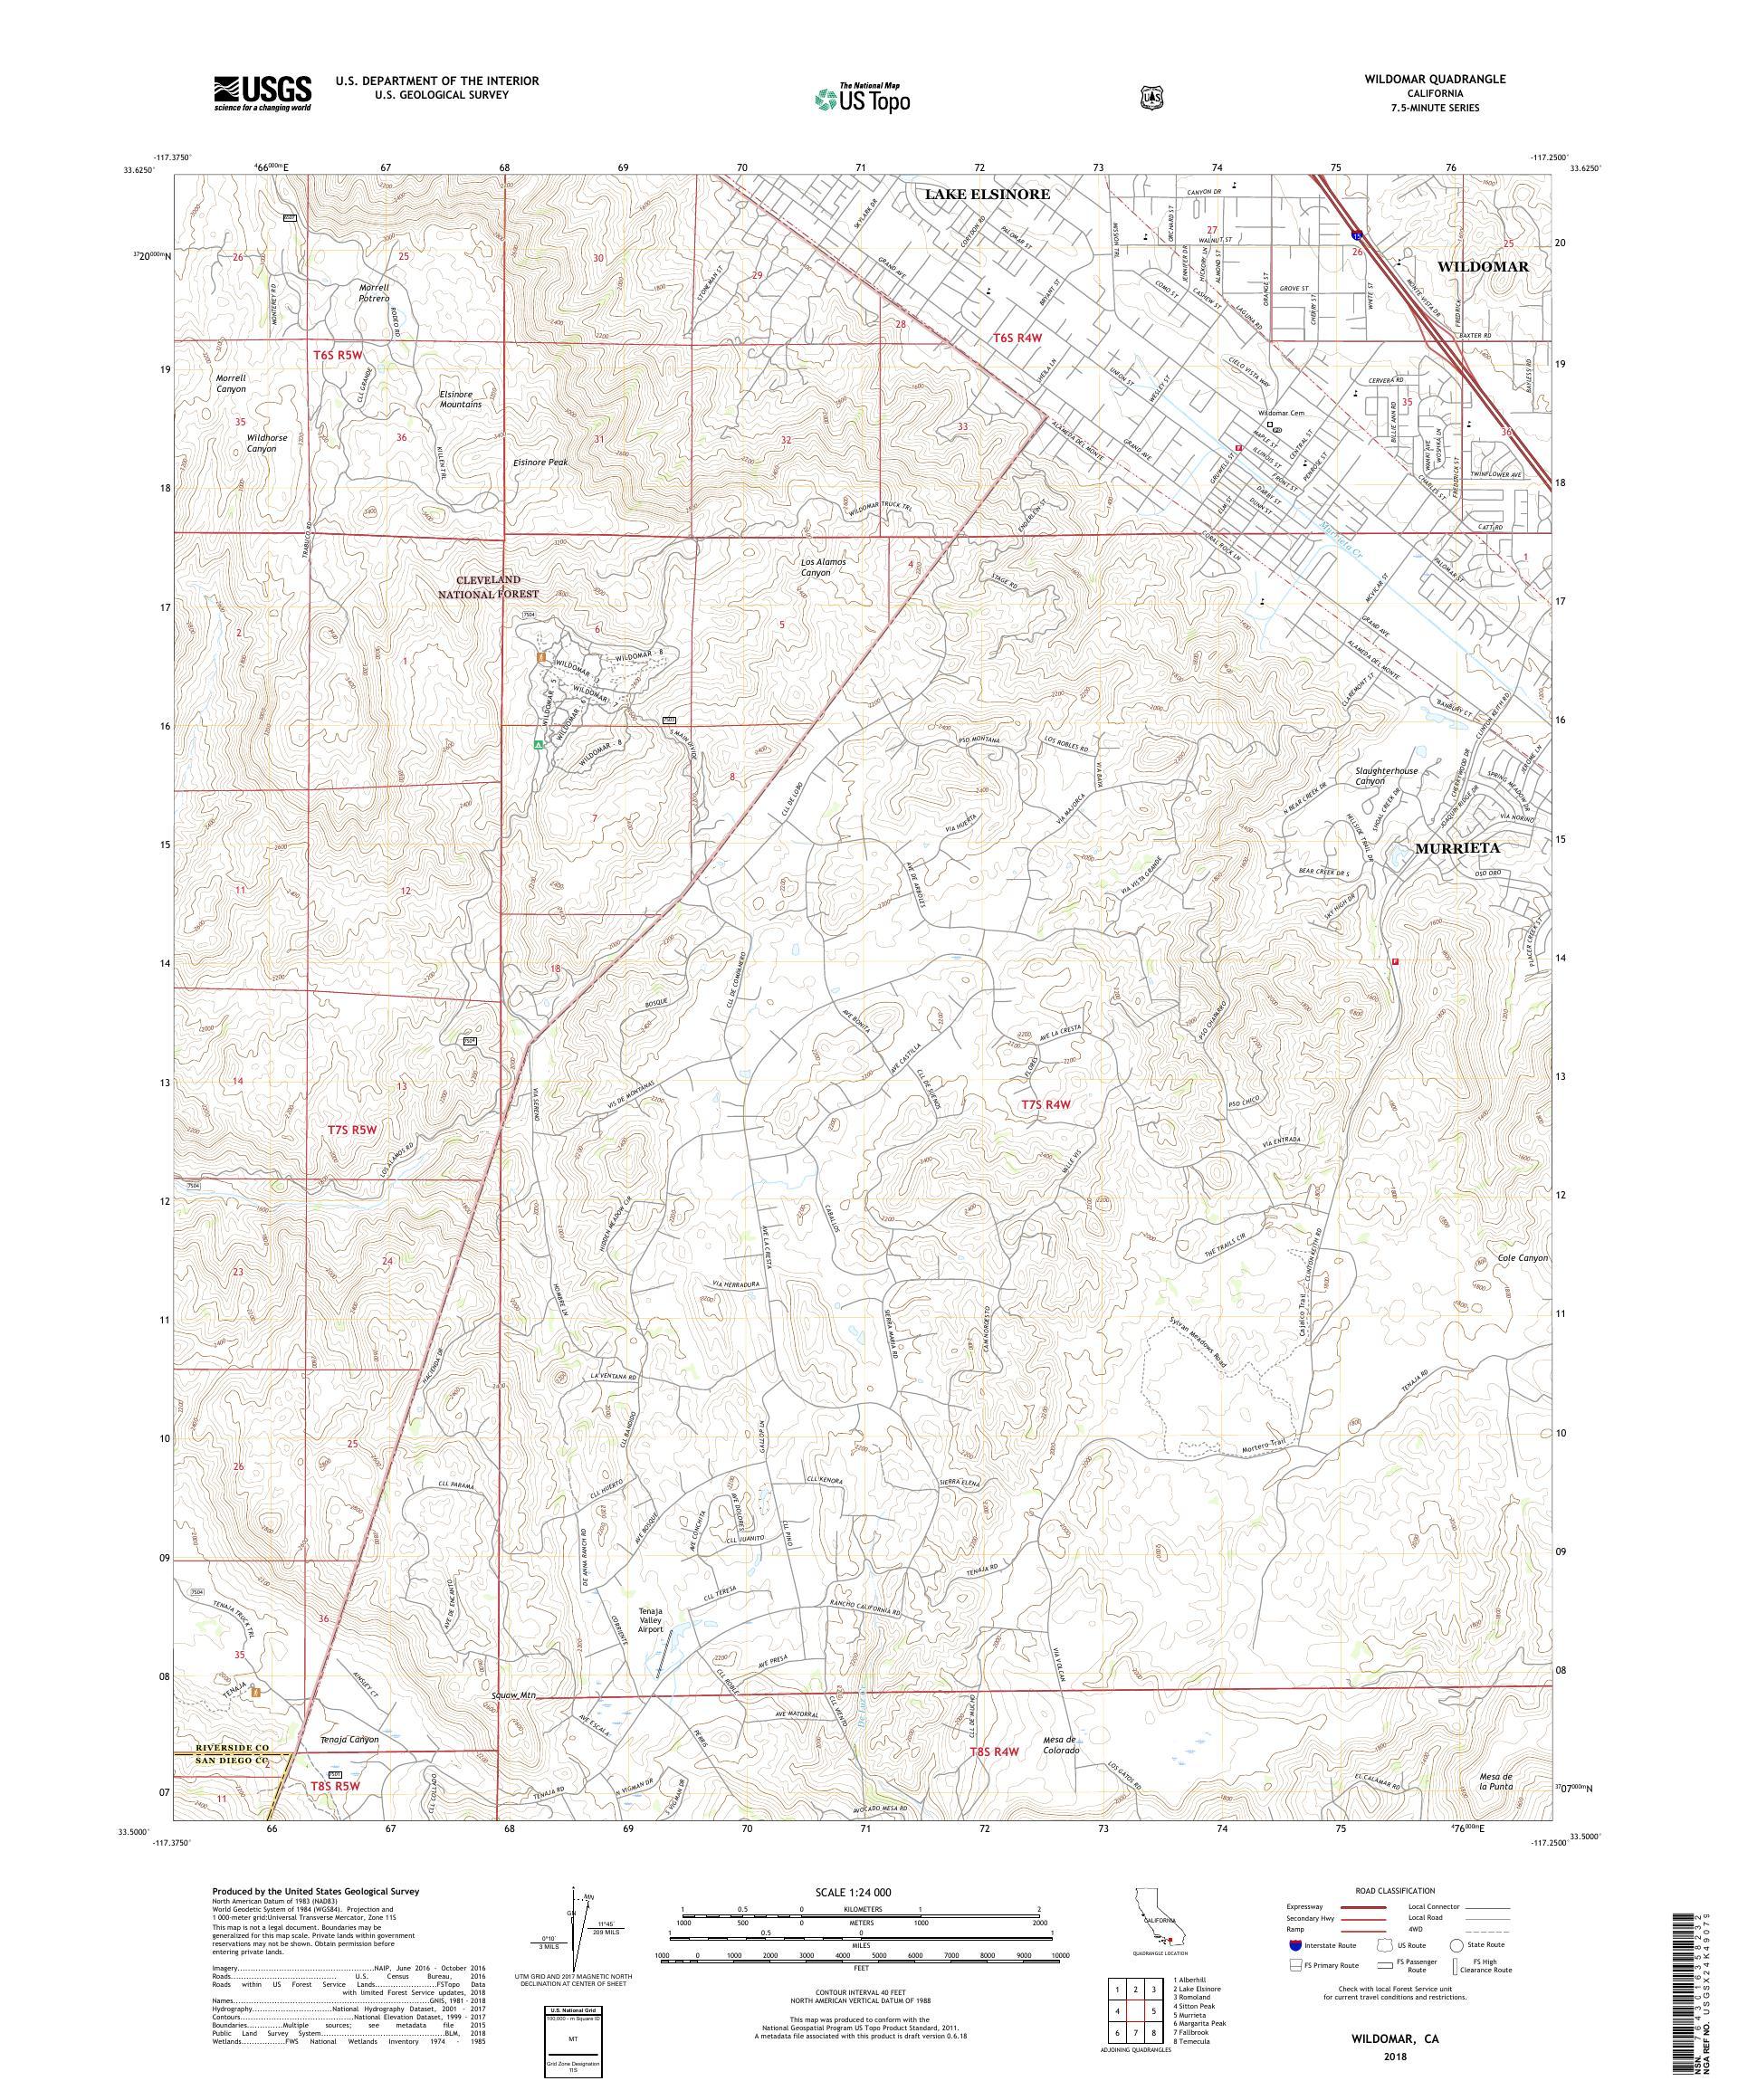 MyTopo Wildomar, California USGS Quad Topo Map